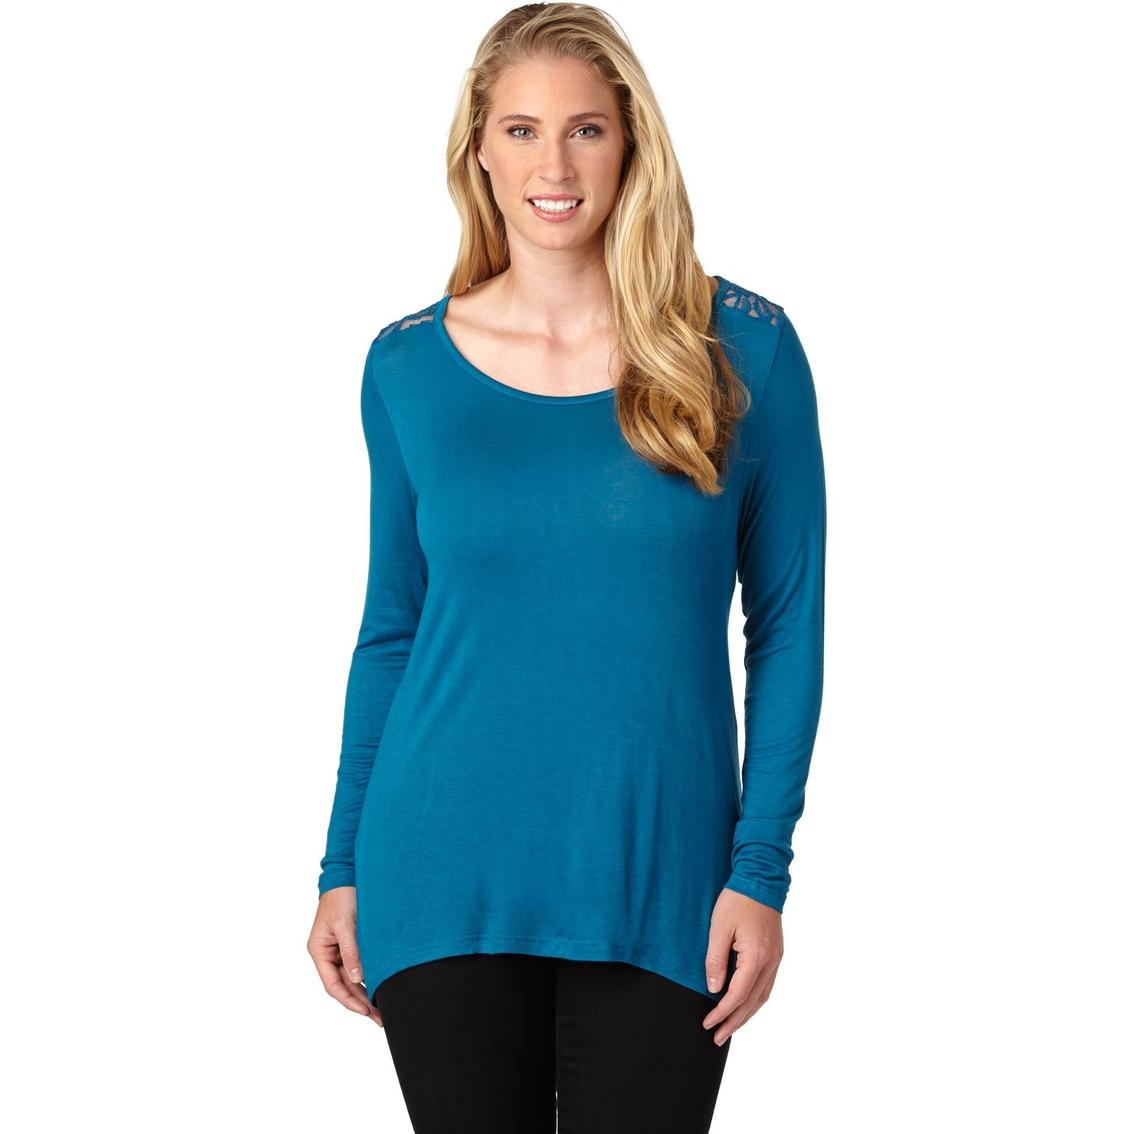 Savante Apparel Plus Size Splash Crochet Lace Top Tops